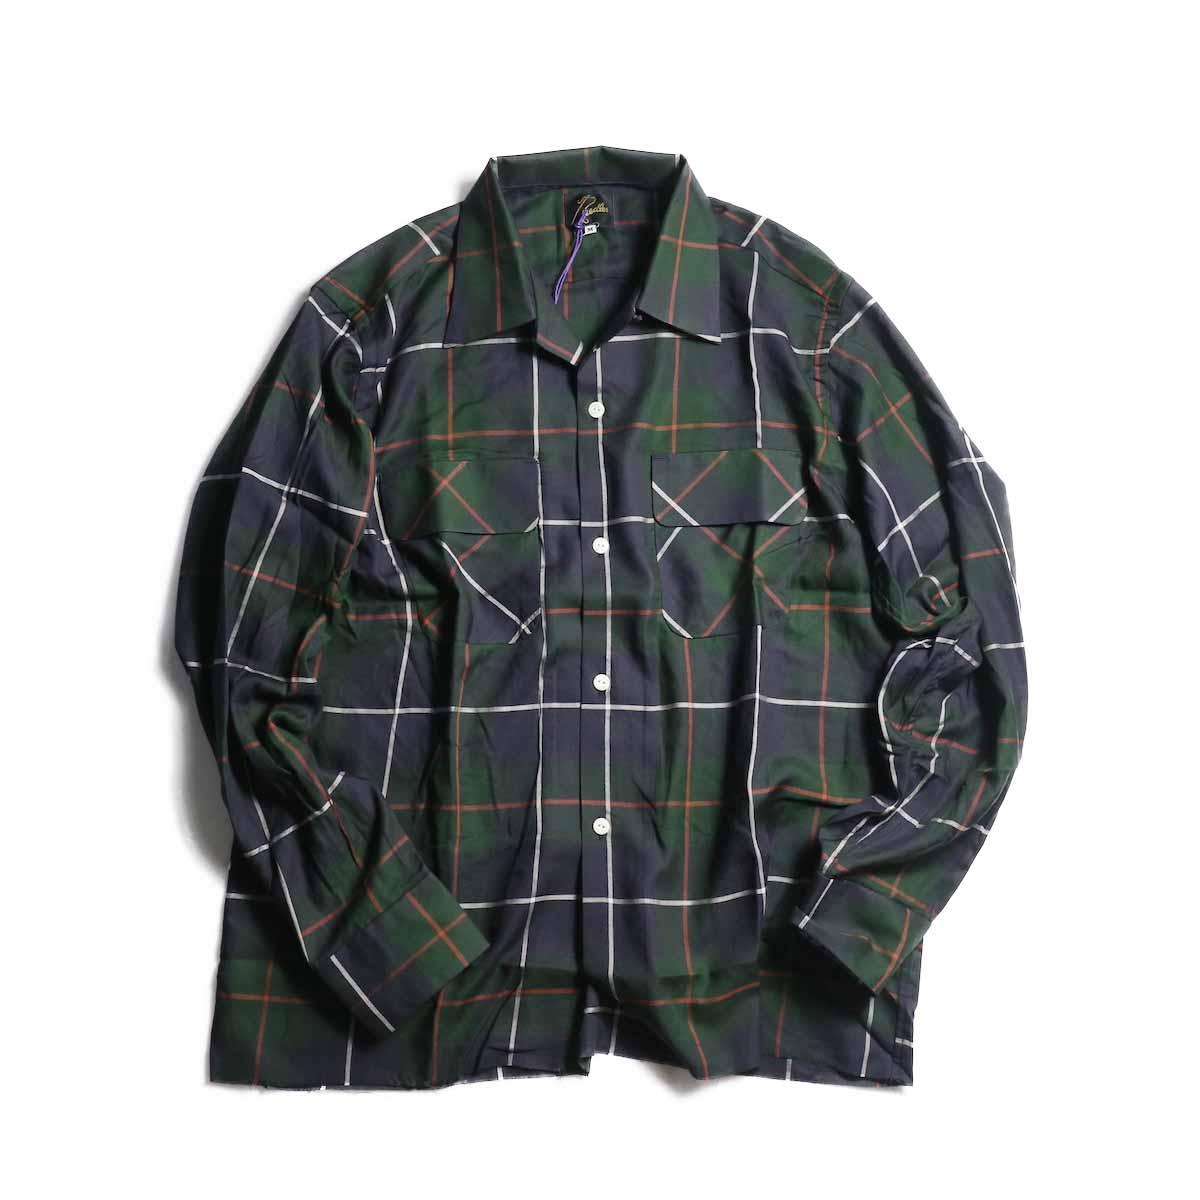 NEEDLES / Cut-Off Bottom Classic Shirt -r/c Plaid Twill (Navy)